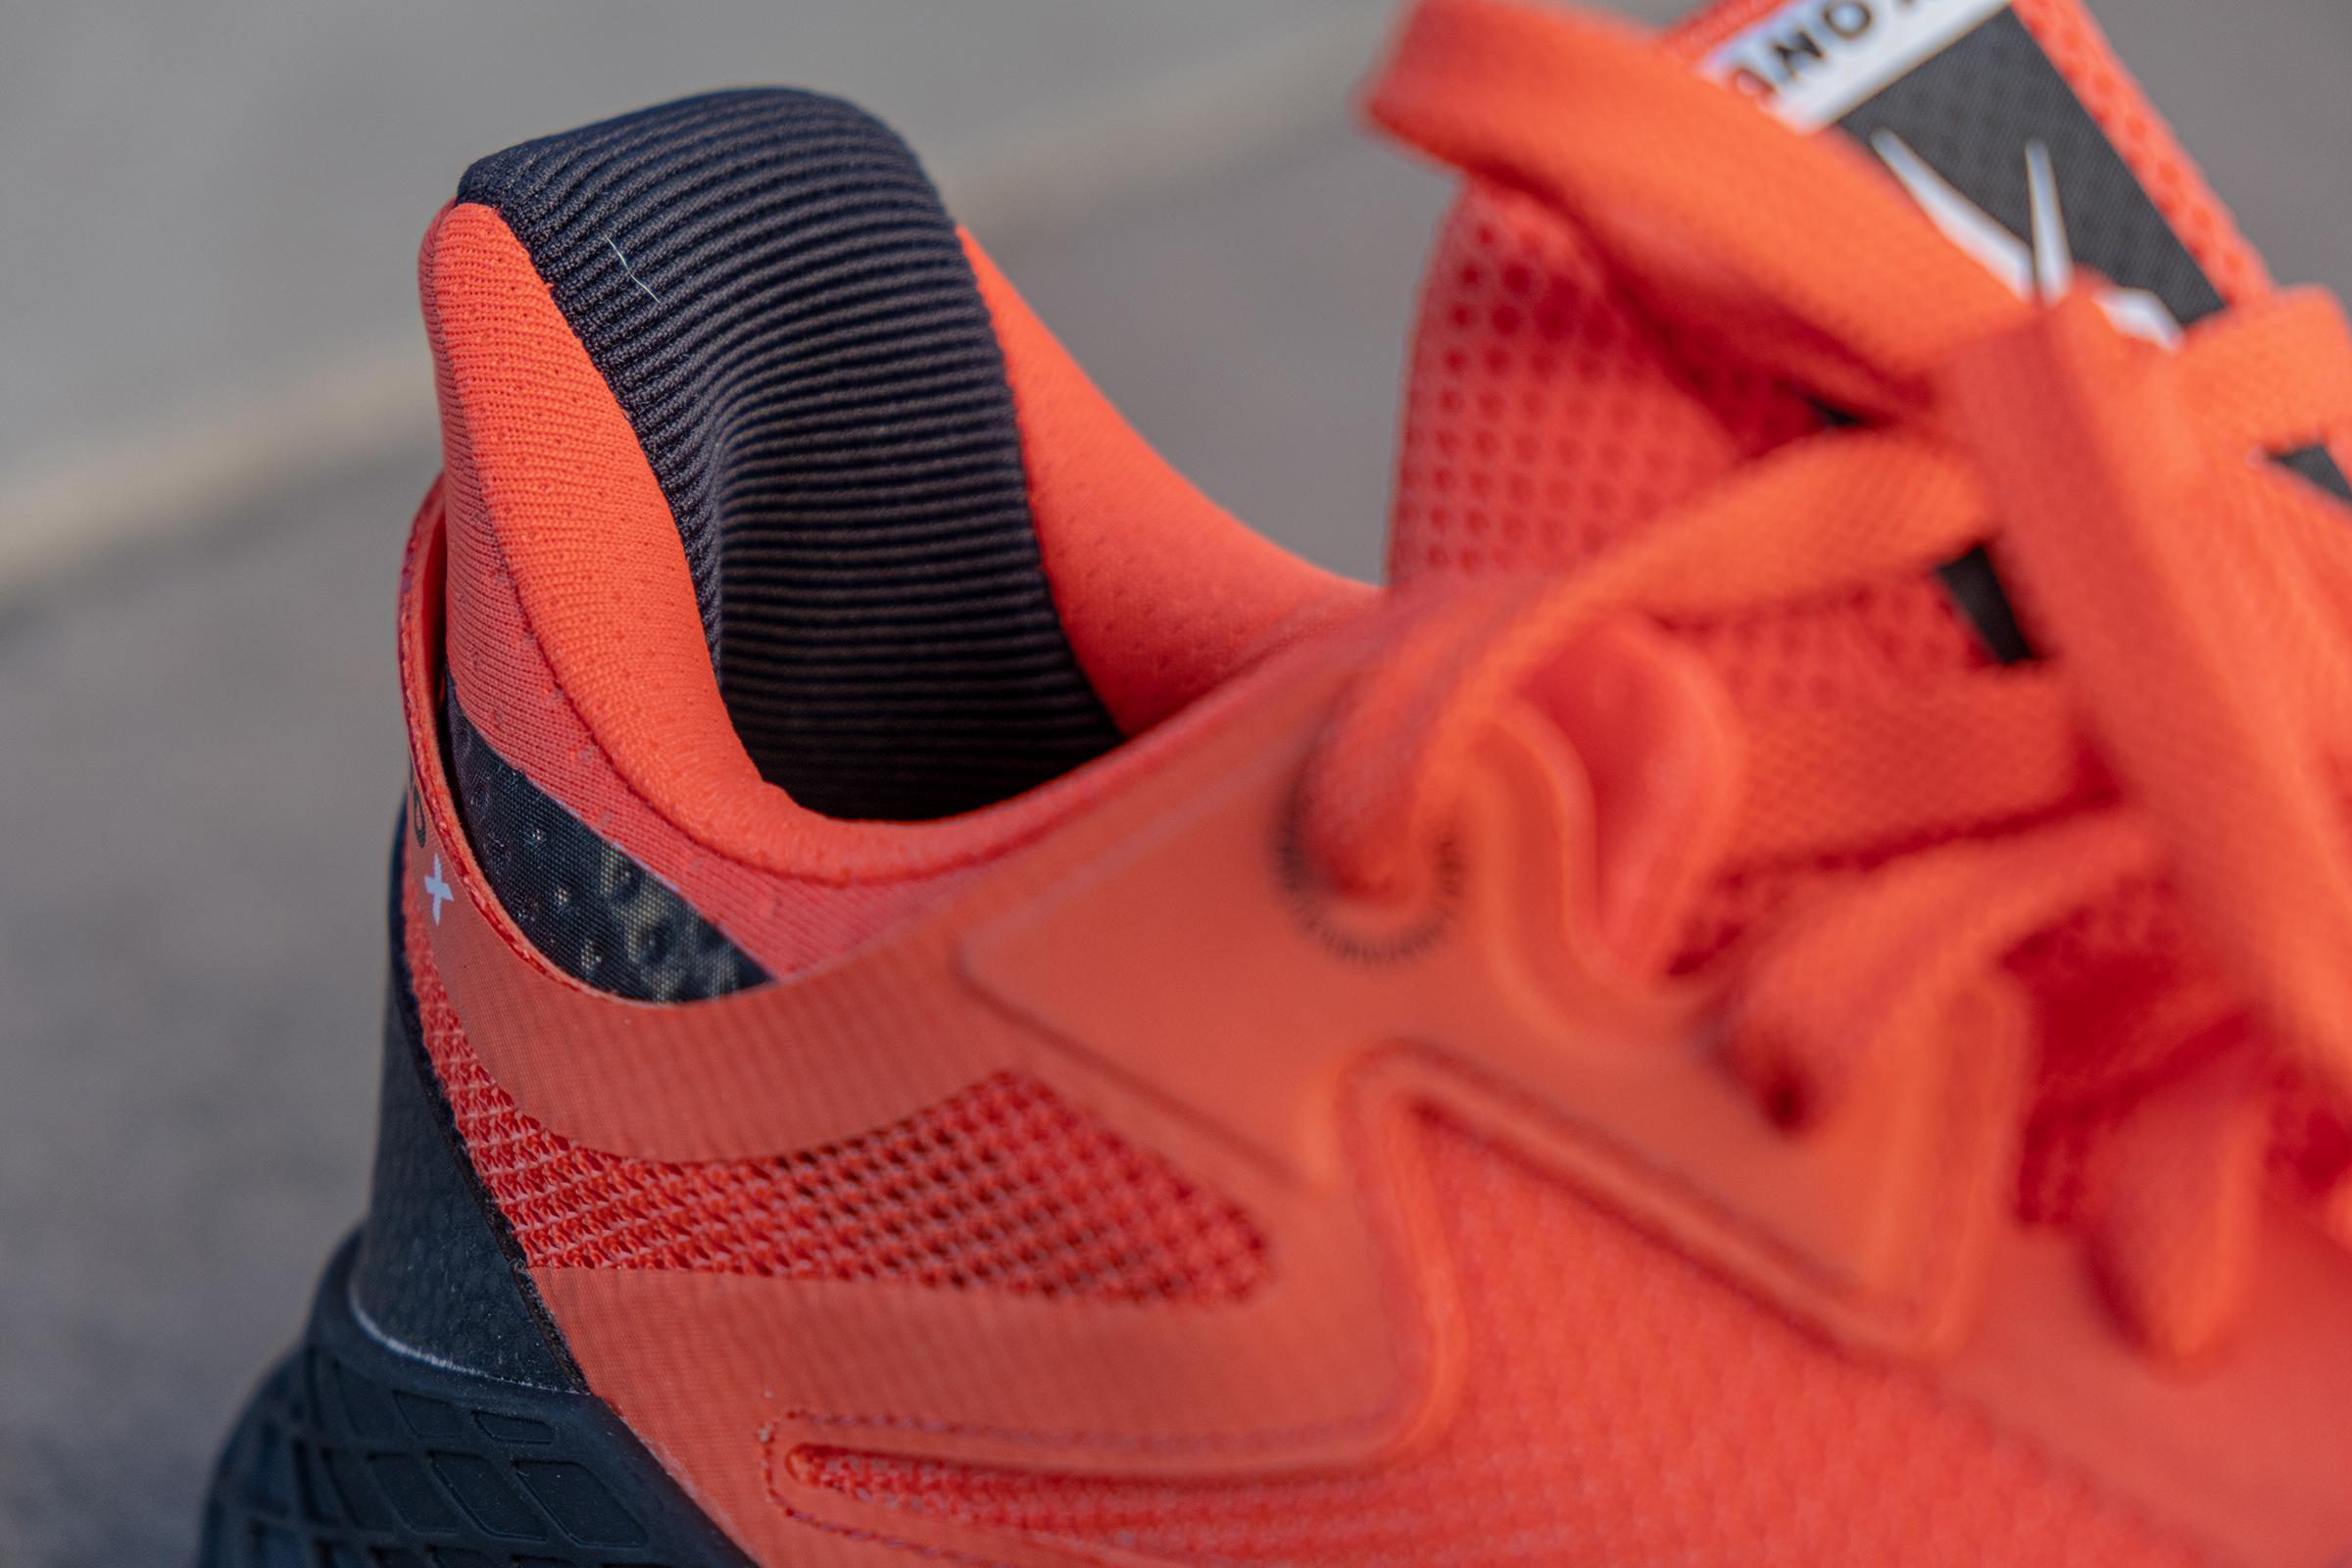 Blownup heel in Nano X